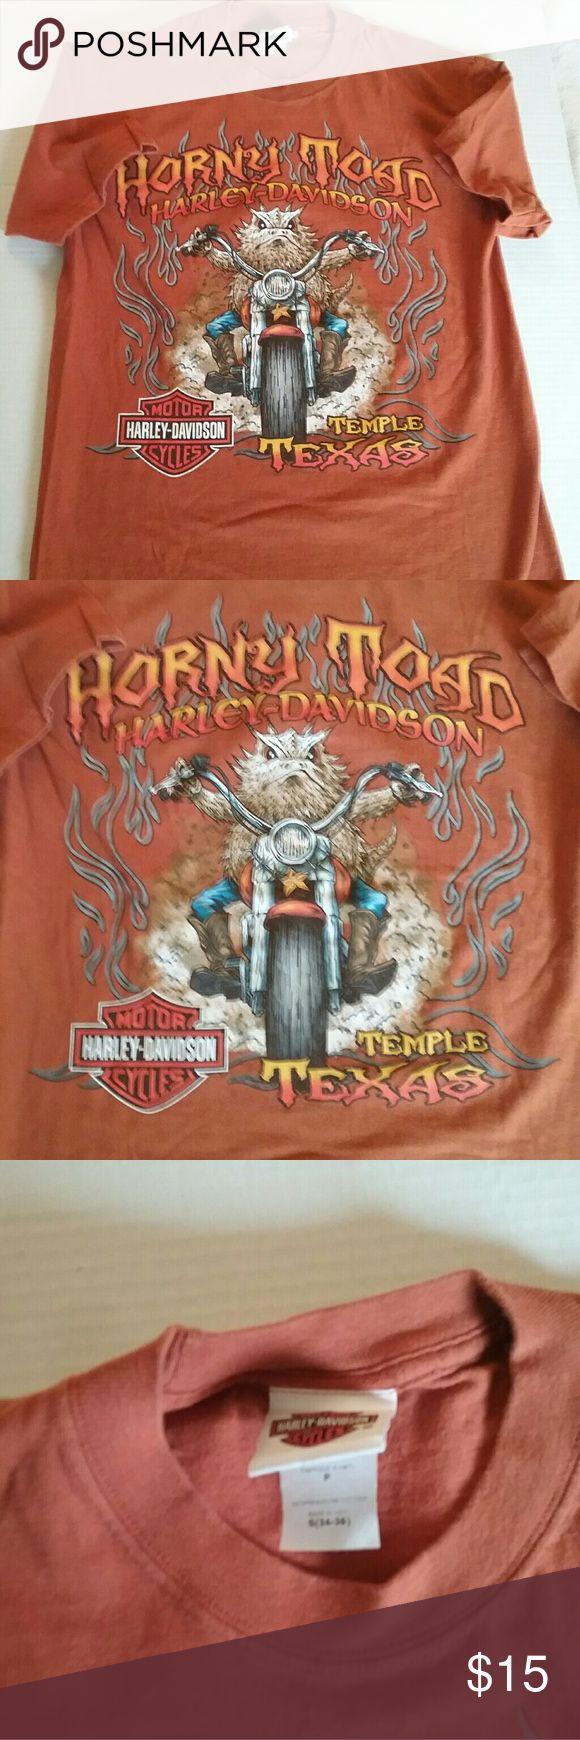 Shirt design killeen tx - Horny Toad Harley Davidson Temple Texas Shirt